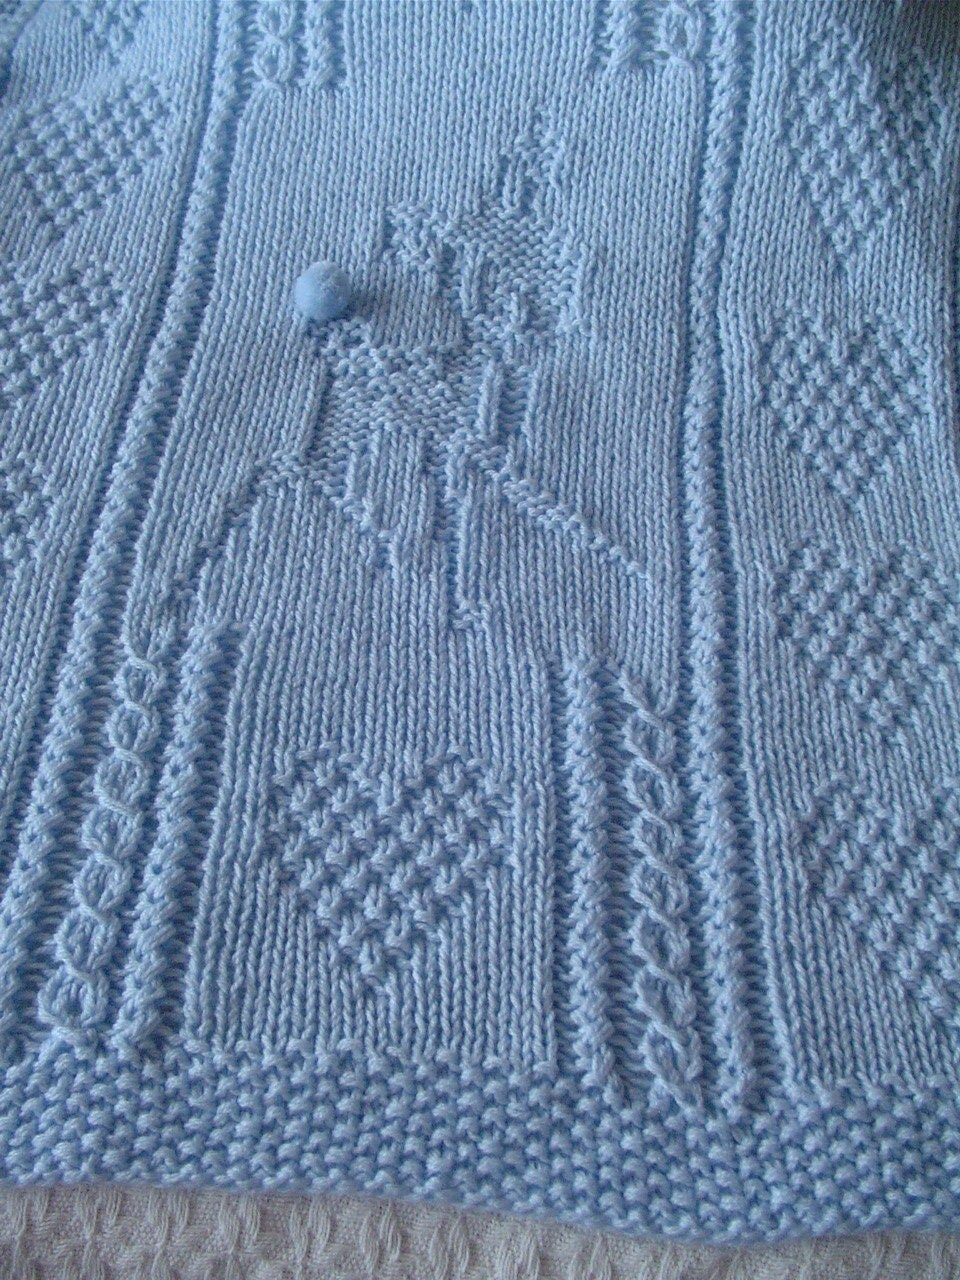 Hand Knitting Blankets : Baby deer blanket blue hand knit